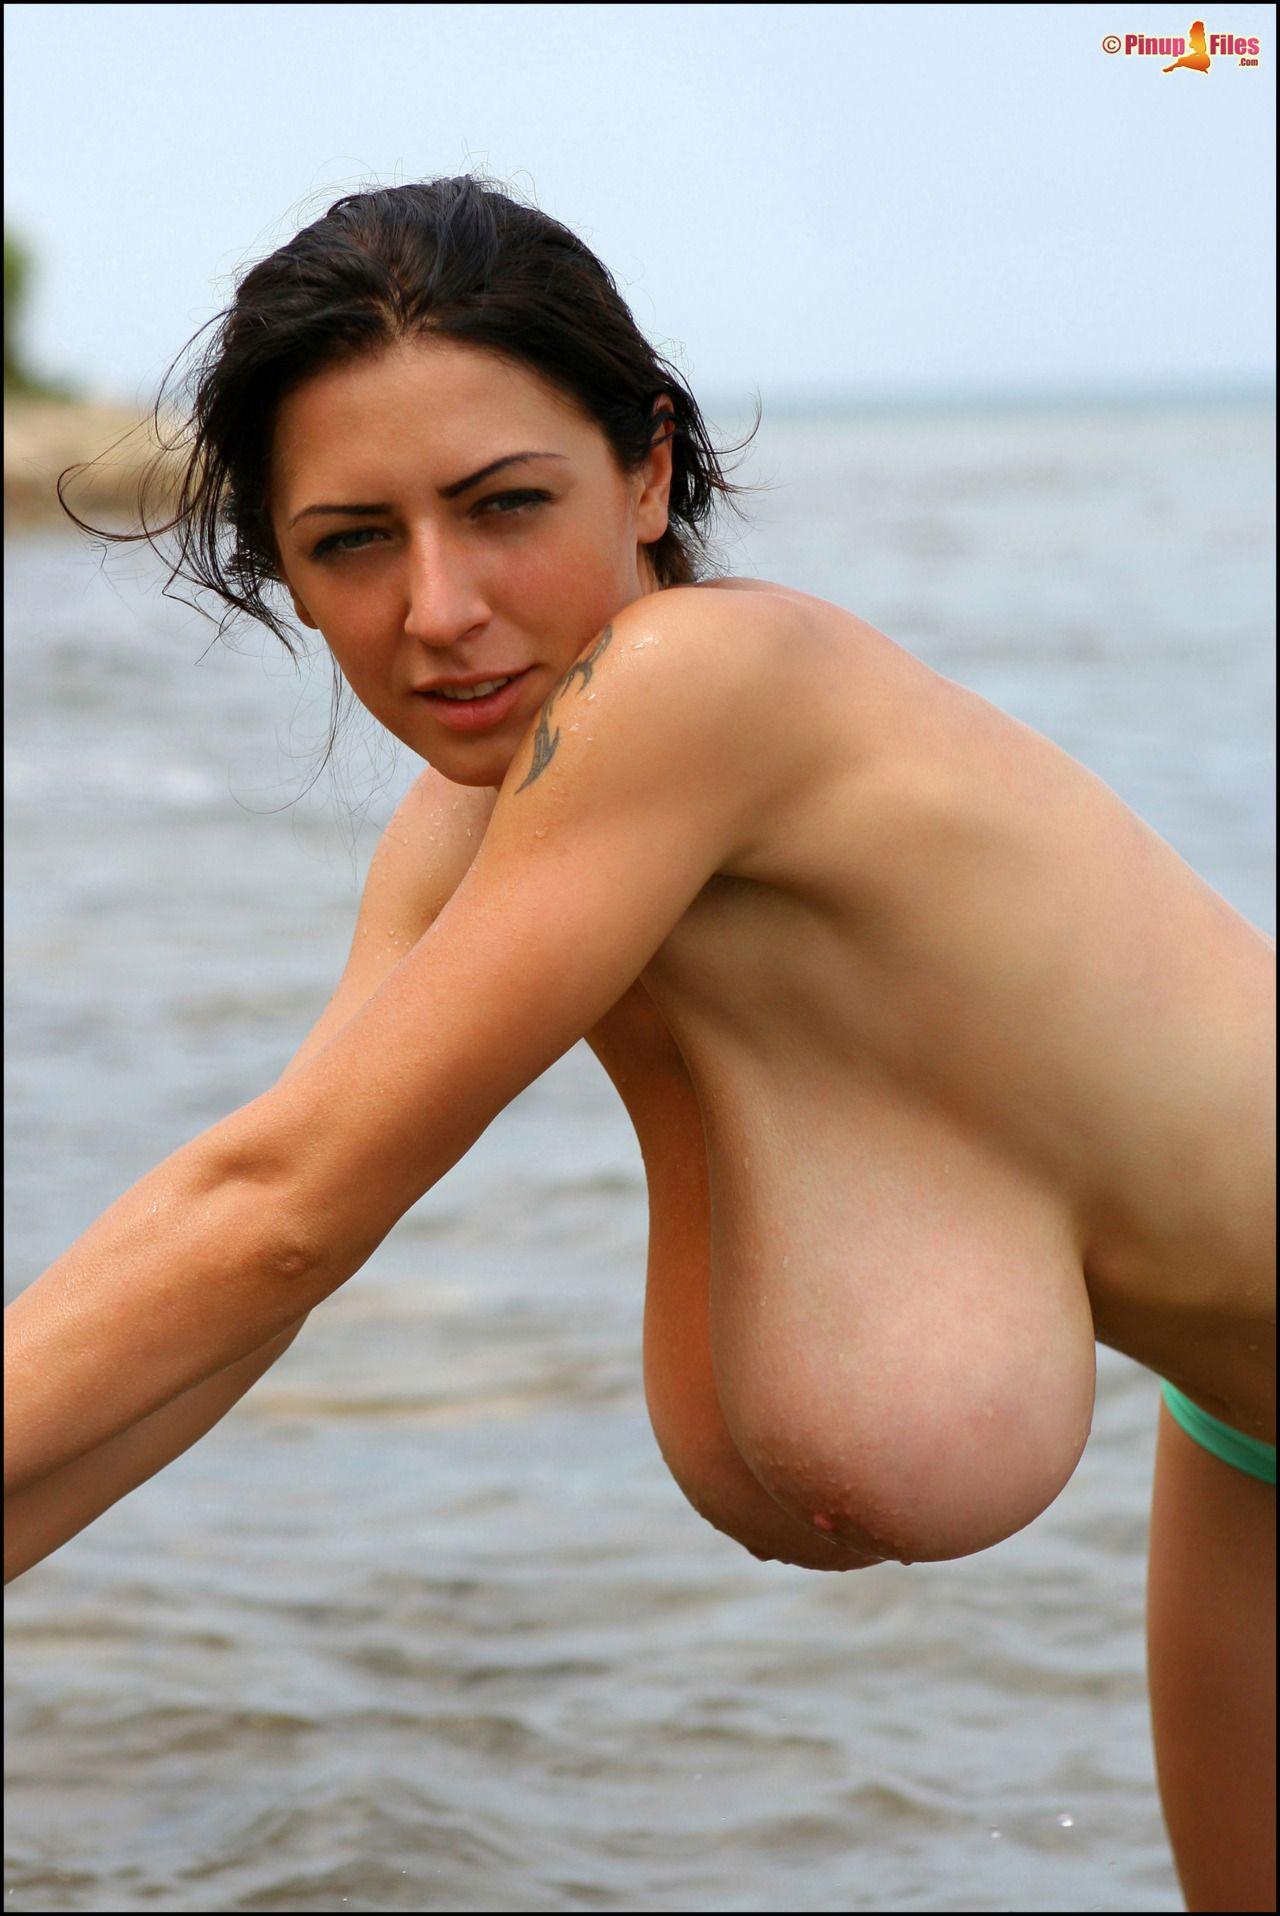 Big and tits boobs